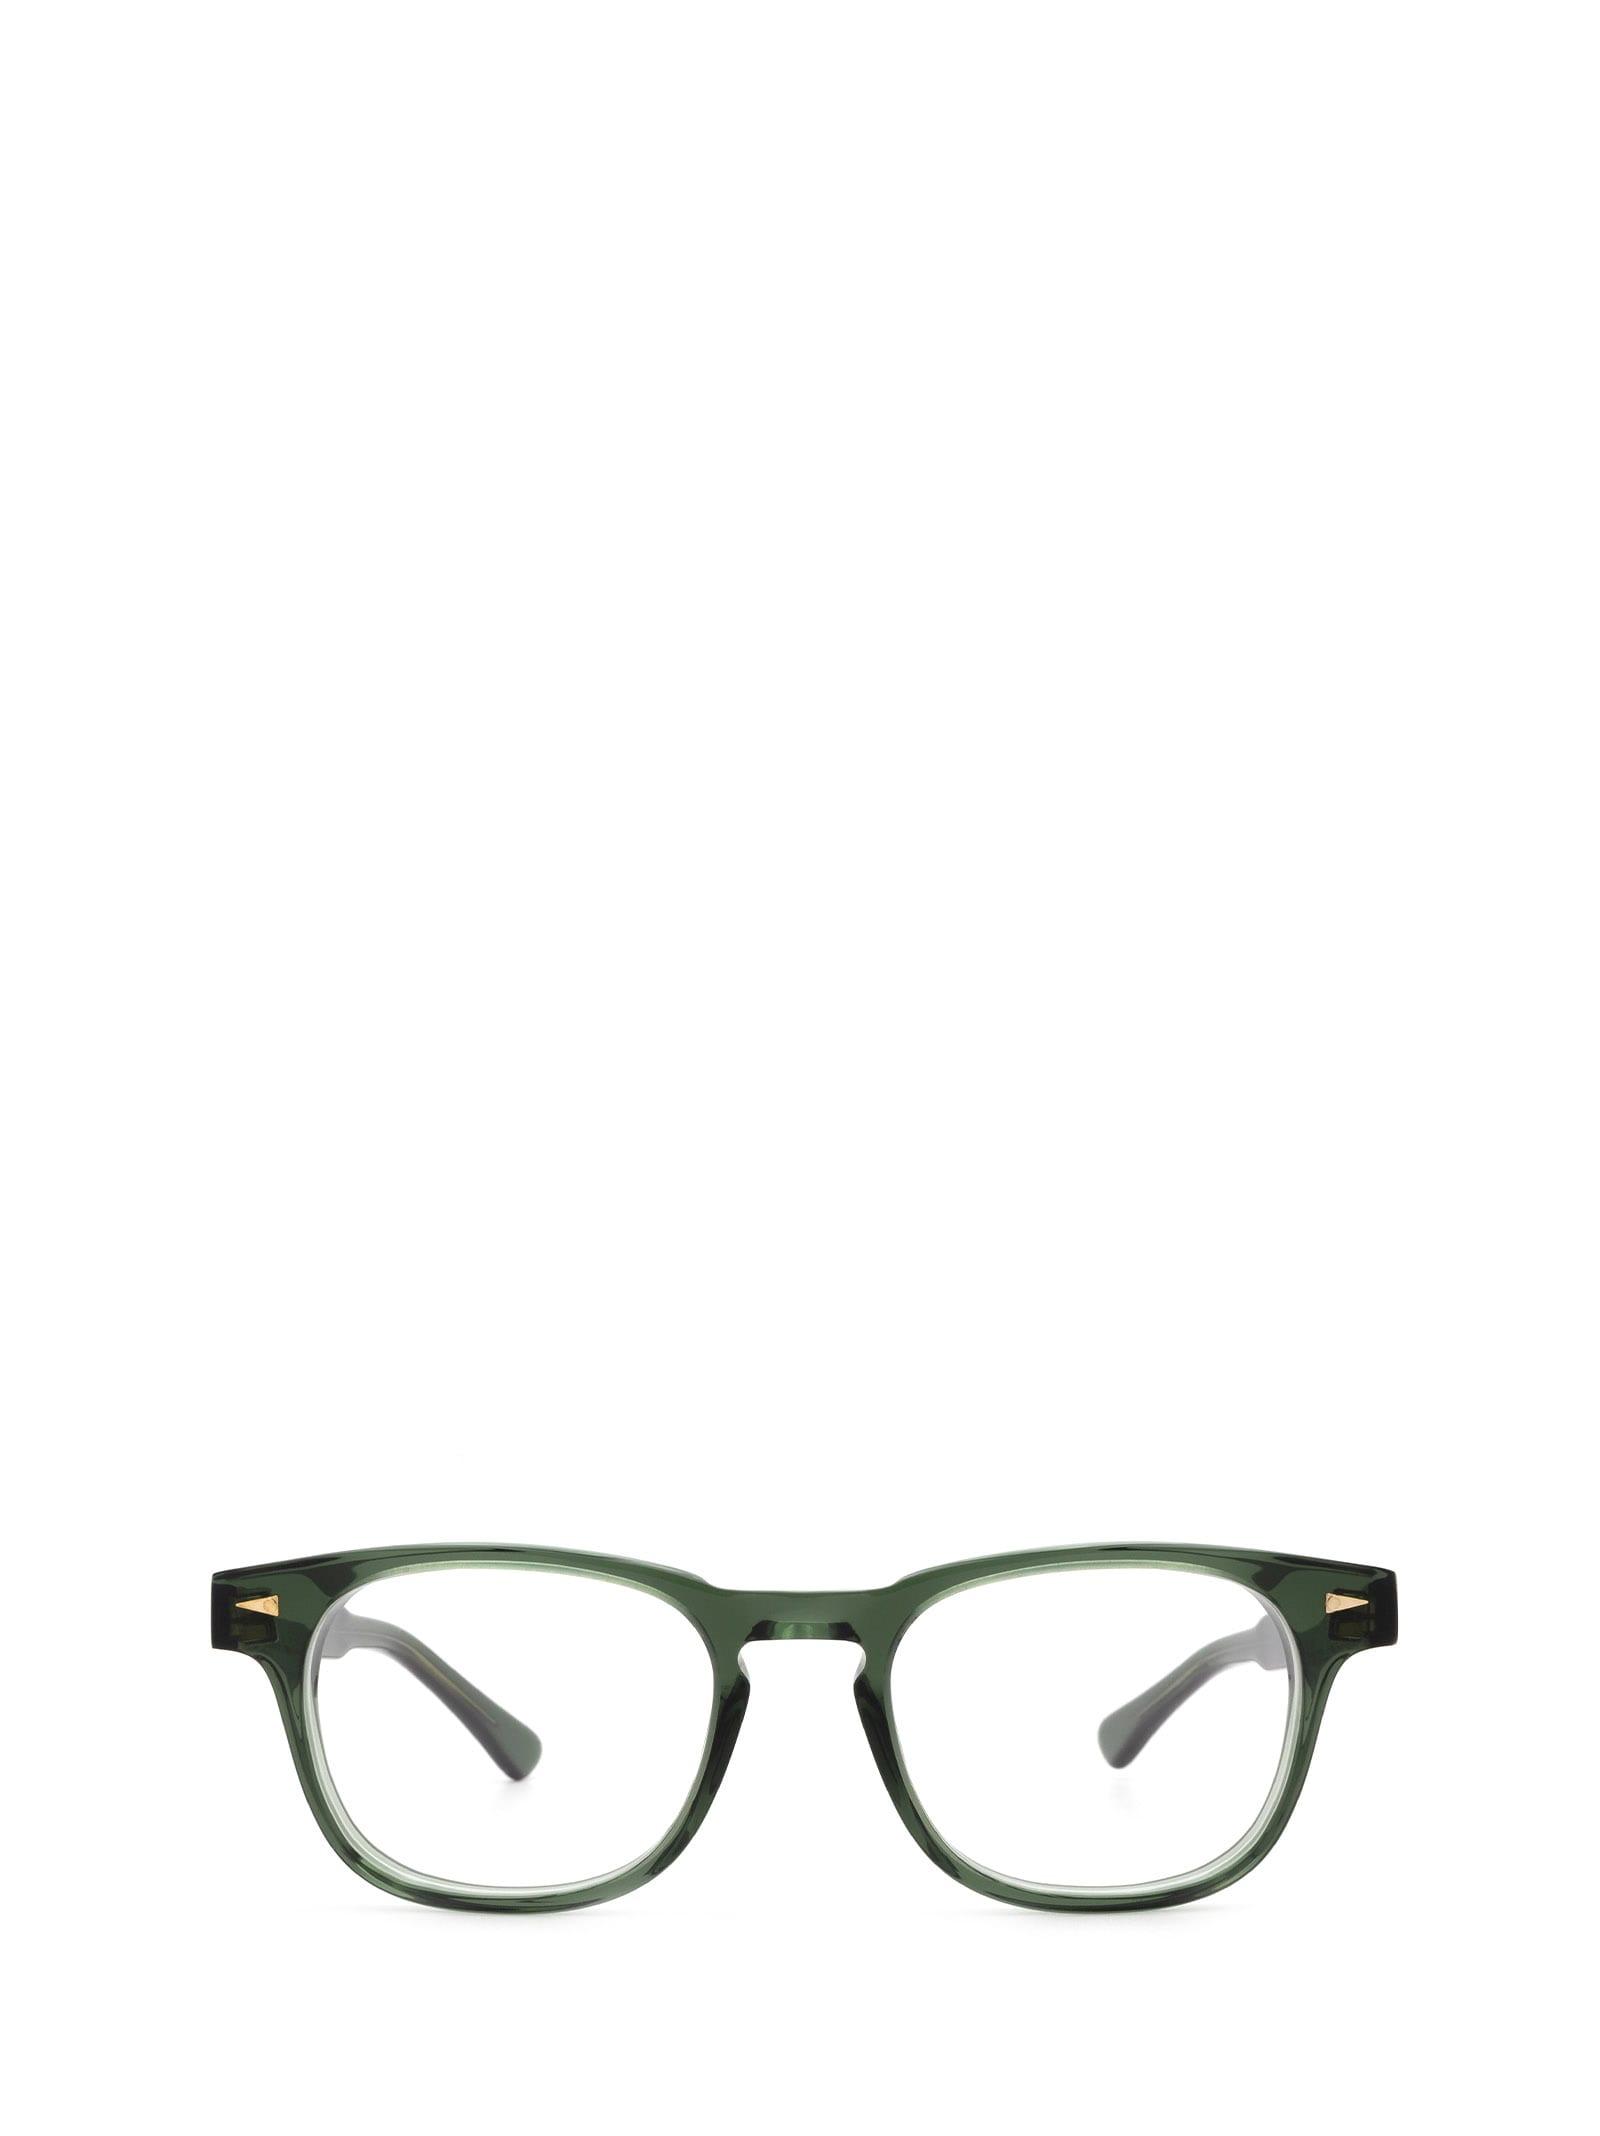 AHLEM Ahlem Rue De Turenne Dark Green Glasses